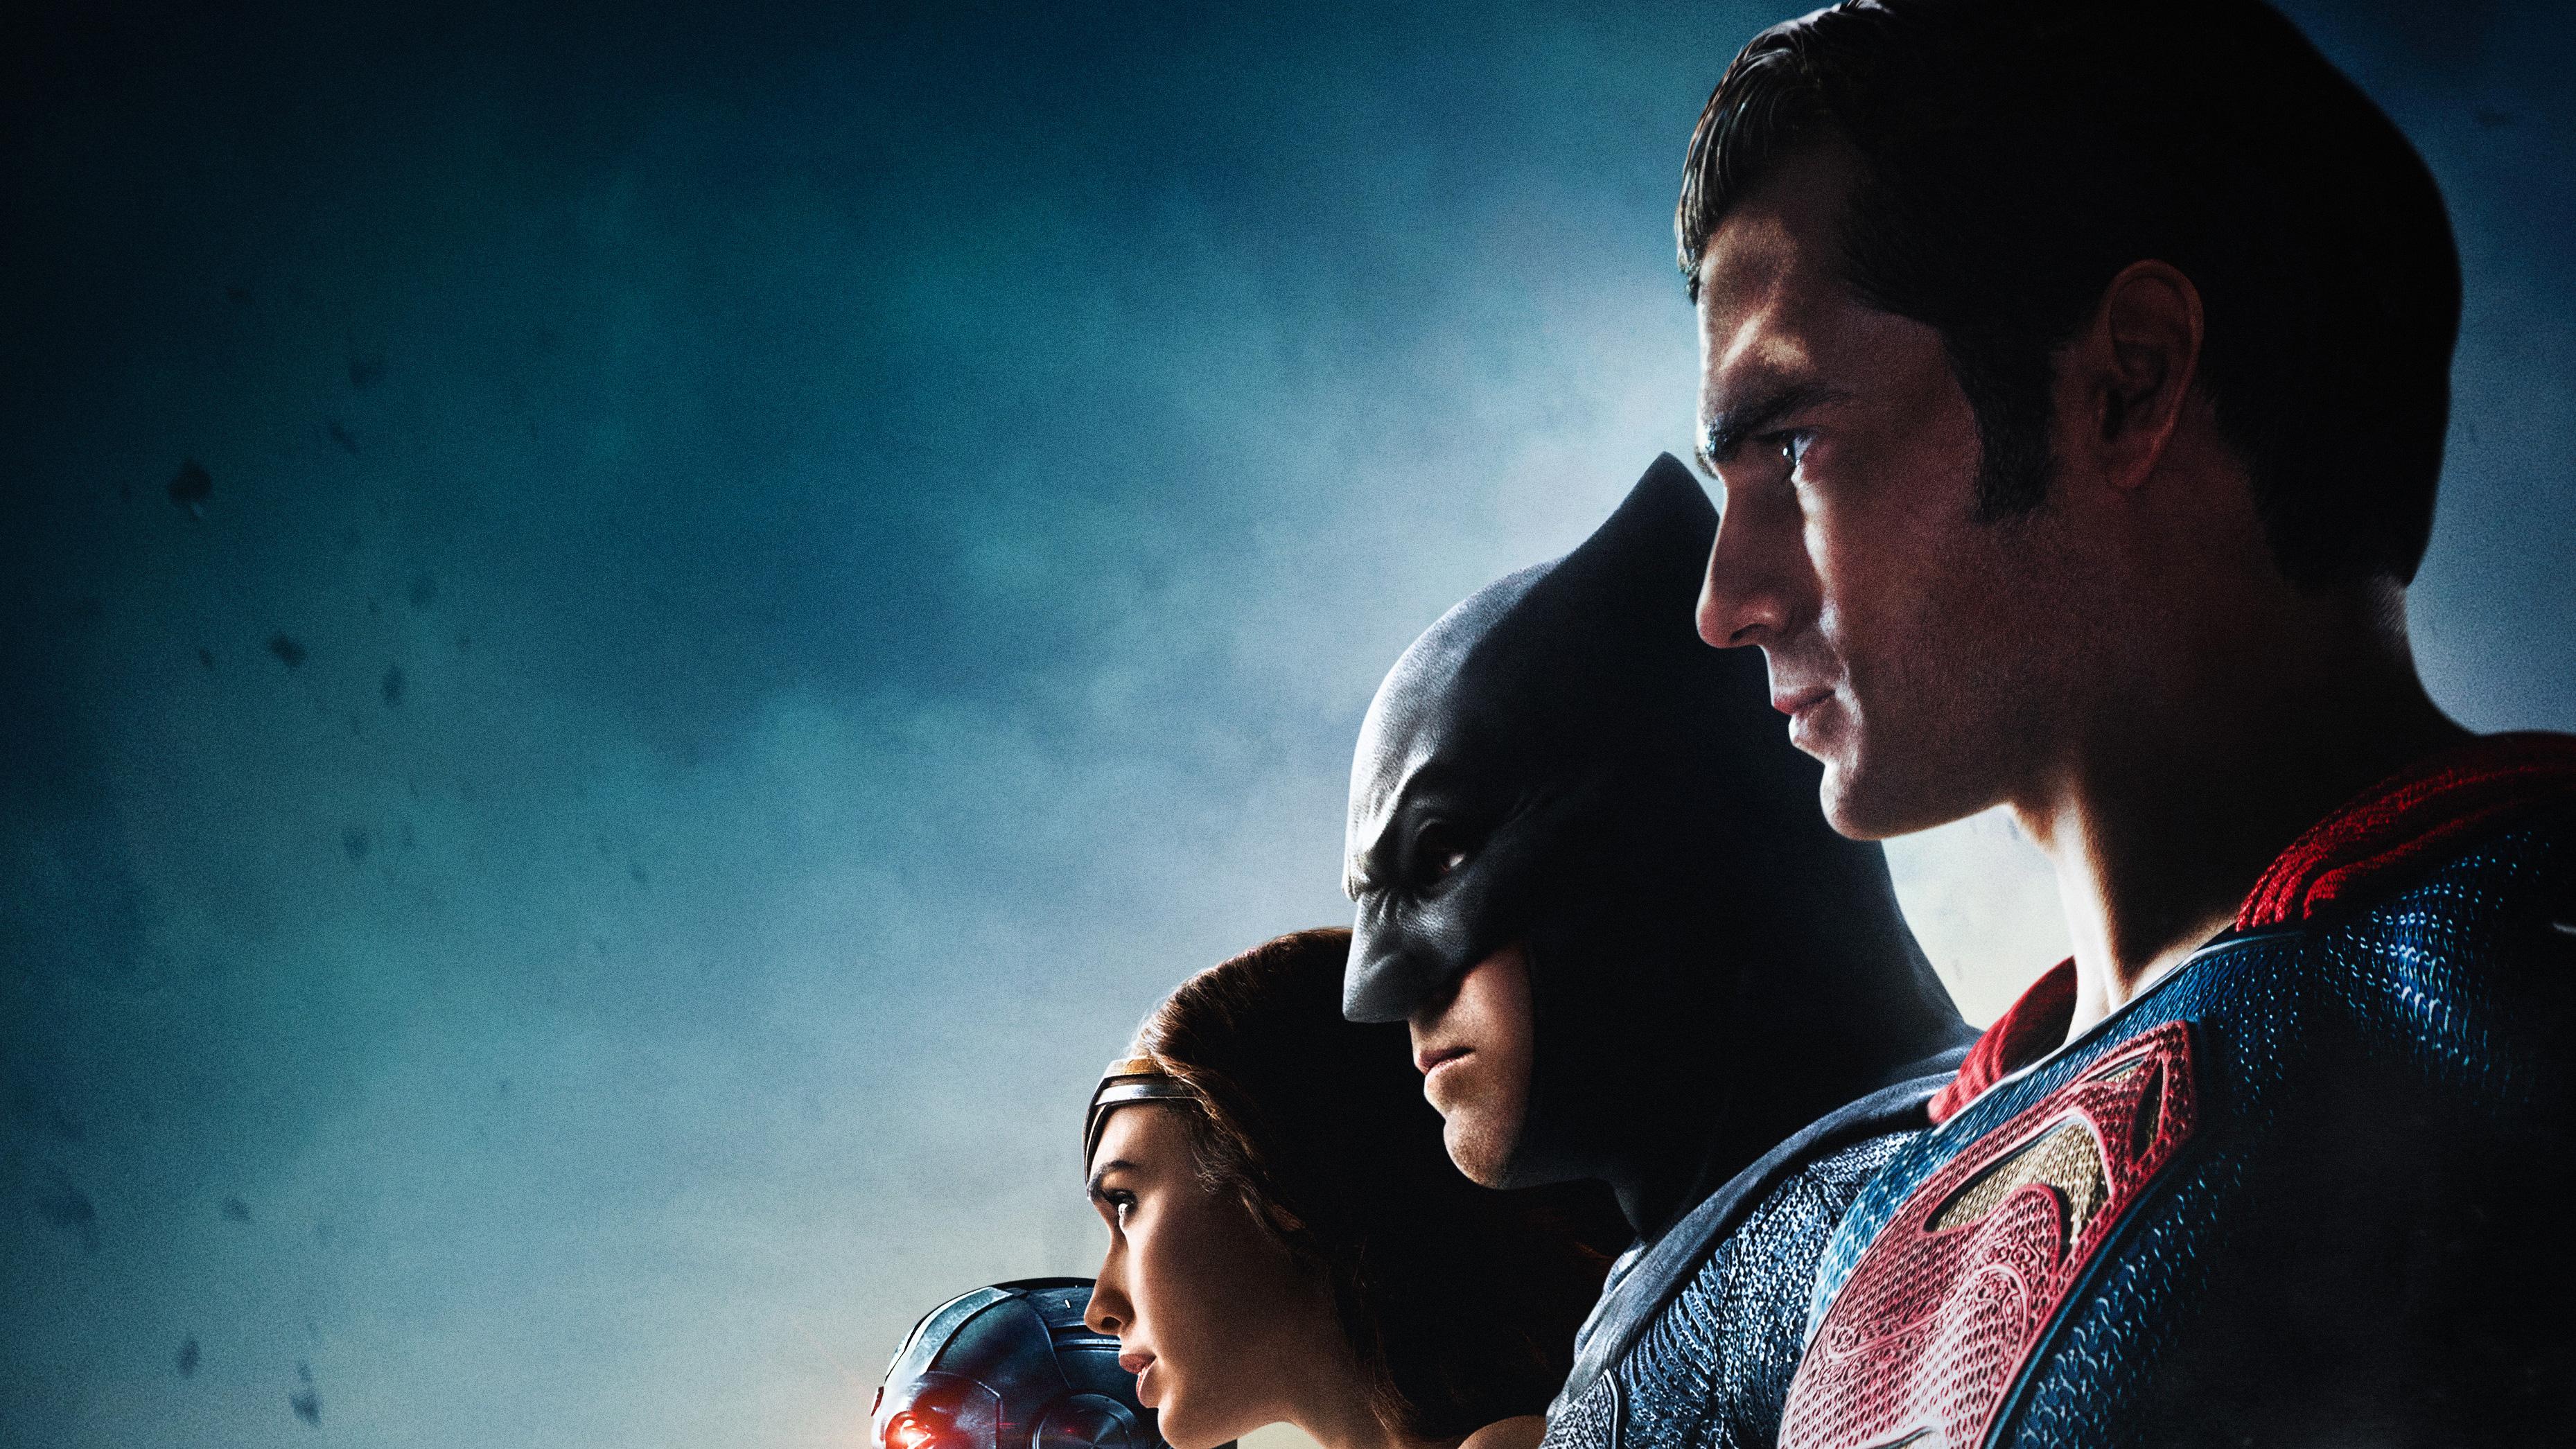 Justice League Movie Hd Movies 4k Wallpapers Images: Superman Batman Wonder Woman Justice League 4k, HD Movies